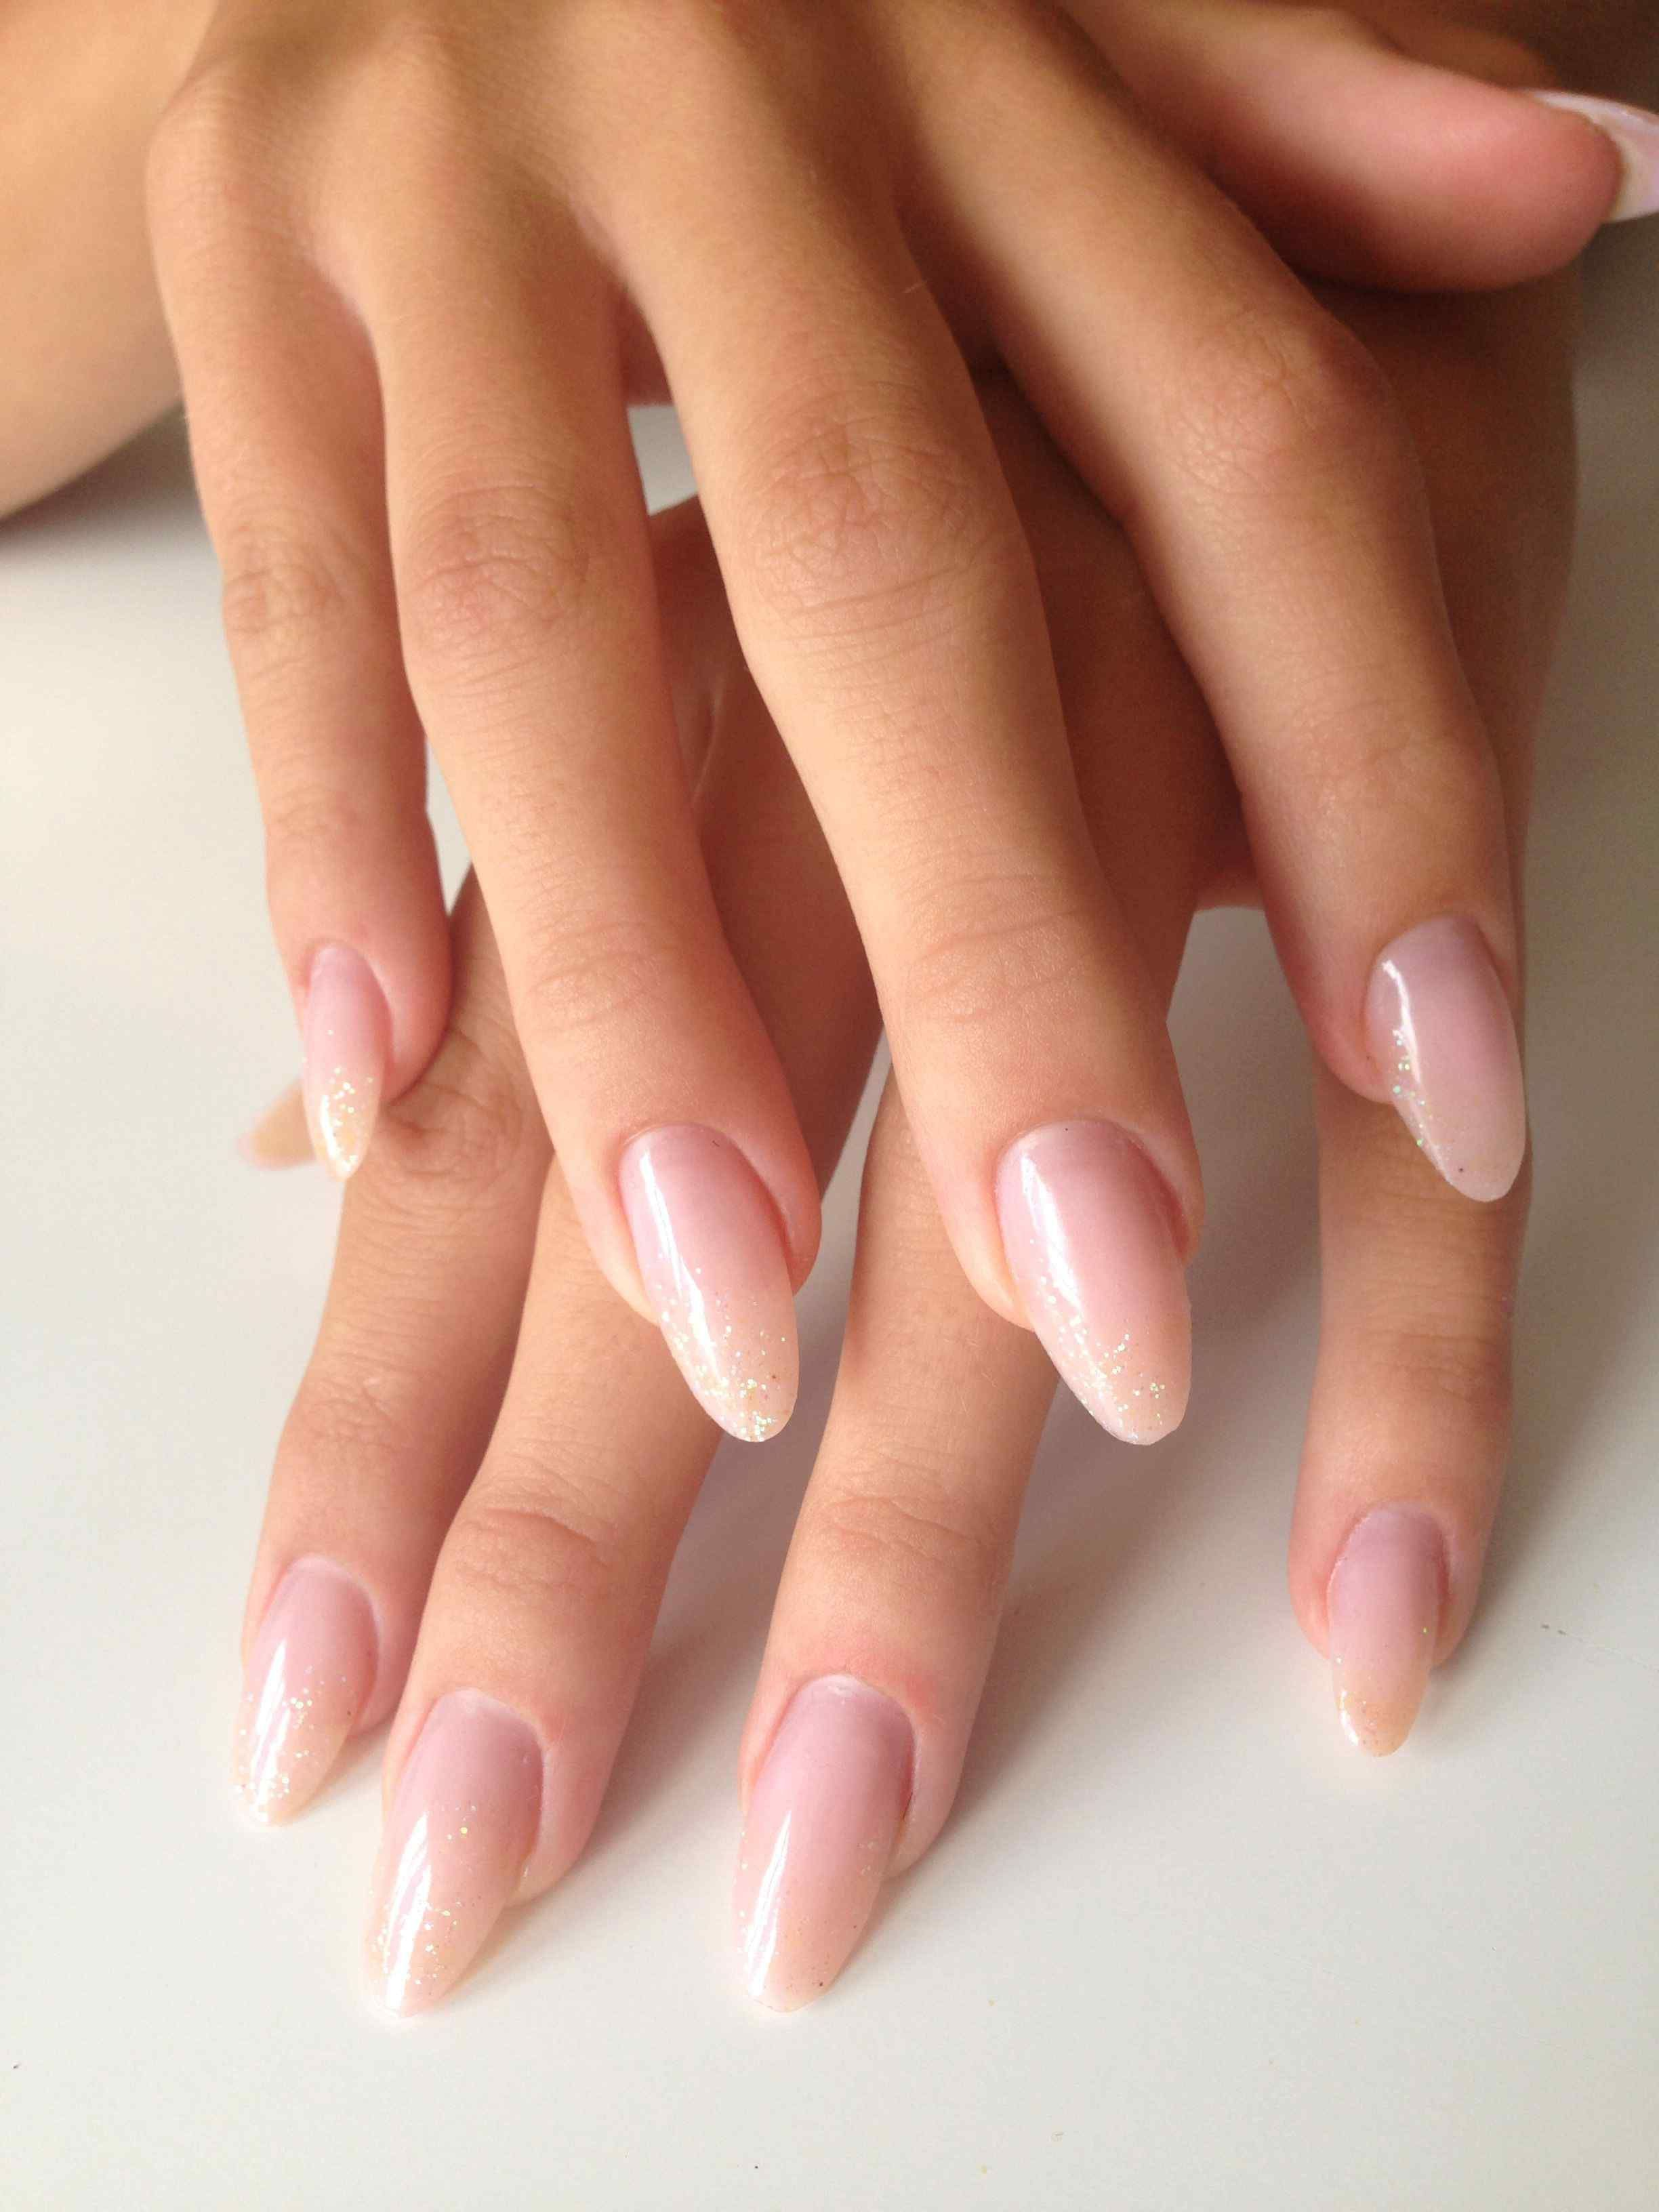 24 New Acrylic Nails No Polish 23 Most Popular Ways To New Nails Acrylic Short Almond Summer 24 New Acrylic N Glitter Nails Acrylic Trendy Nails Oval Nails